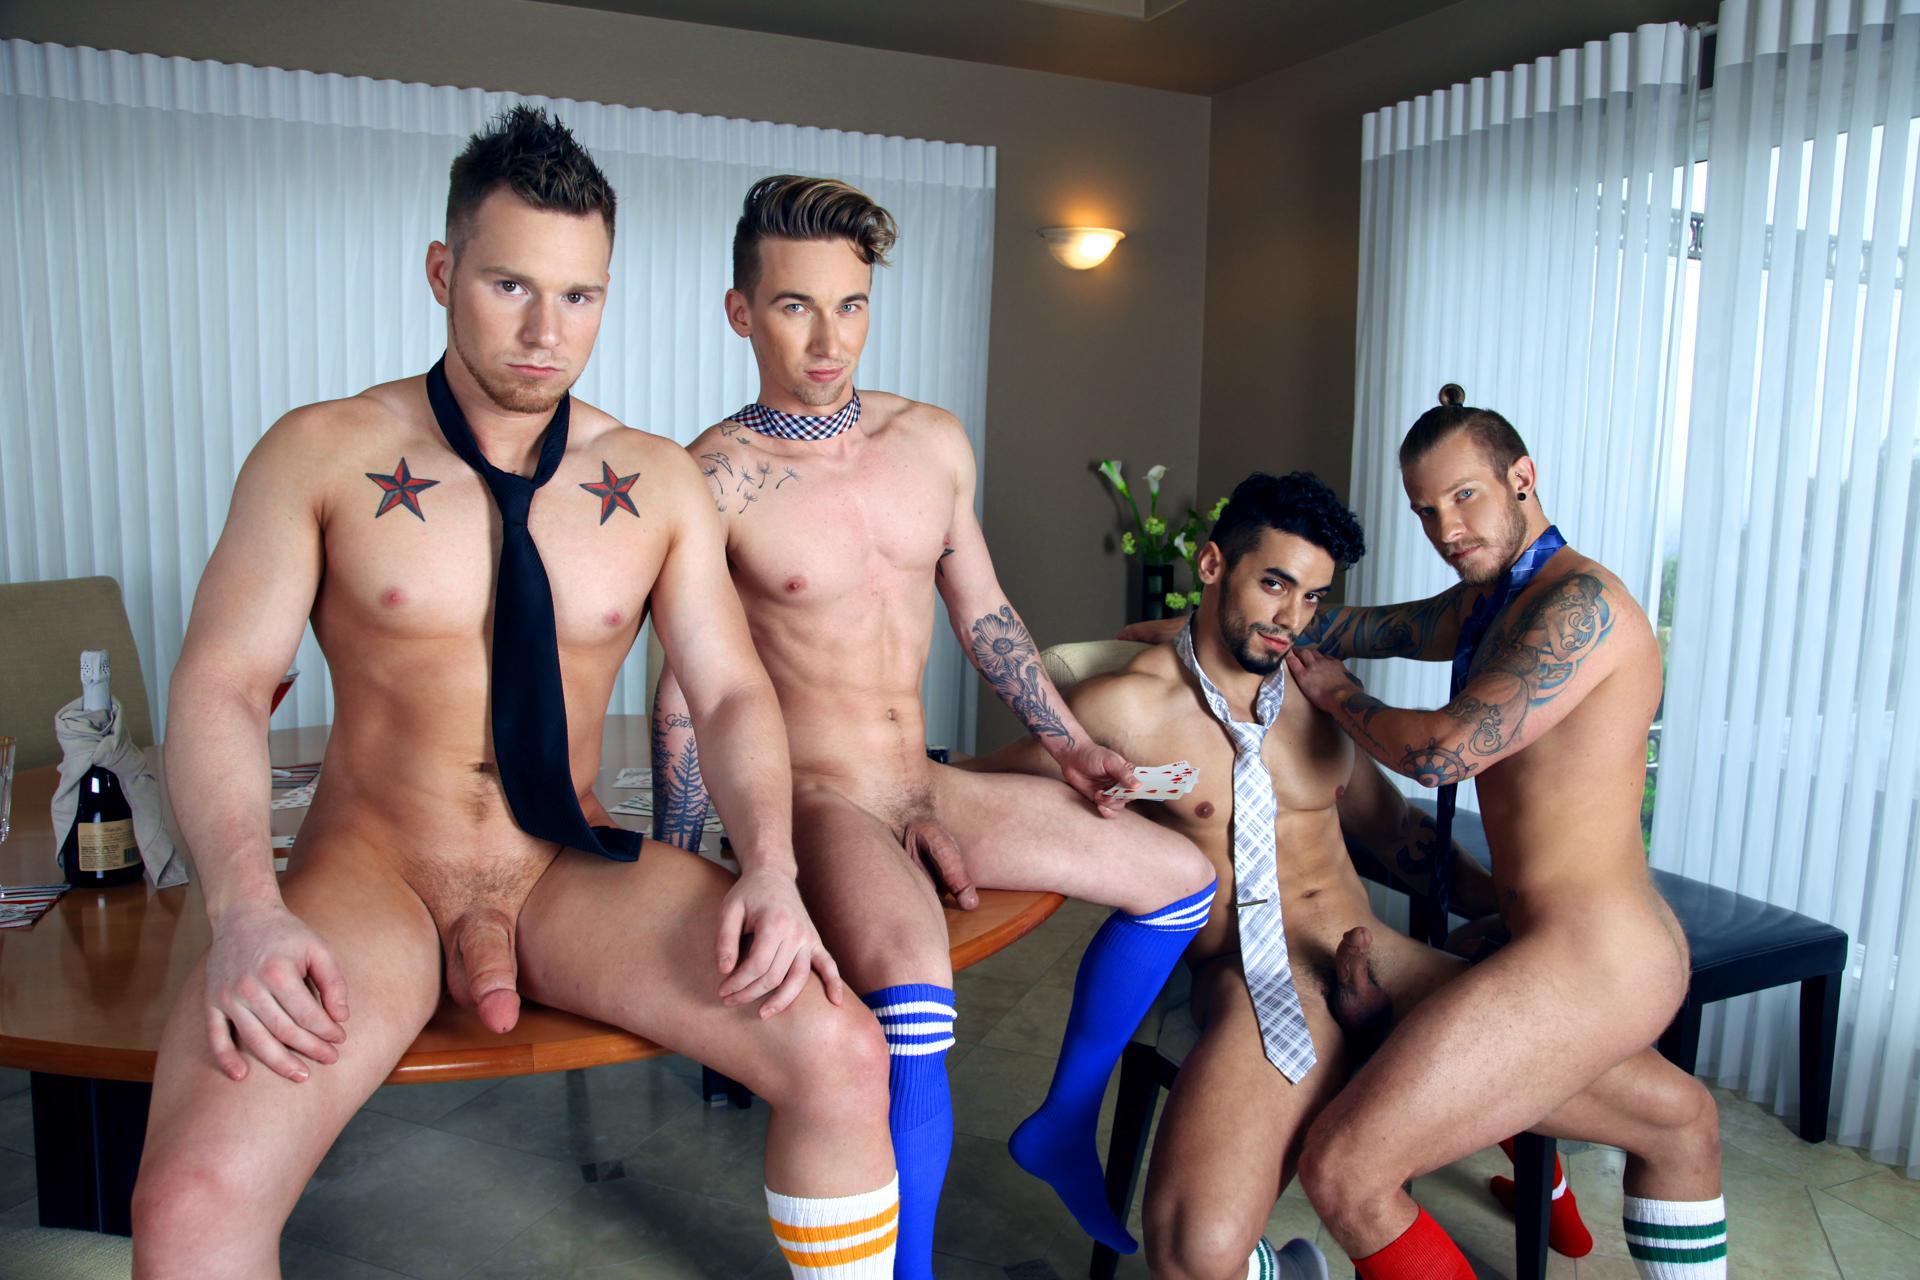 Jaxon Colt, Ashton Webber, Arad and Owen Michaels 3